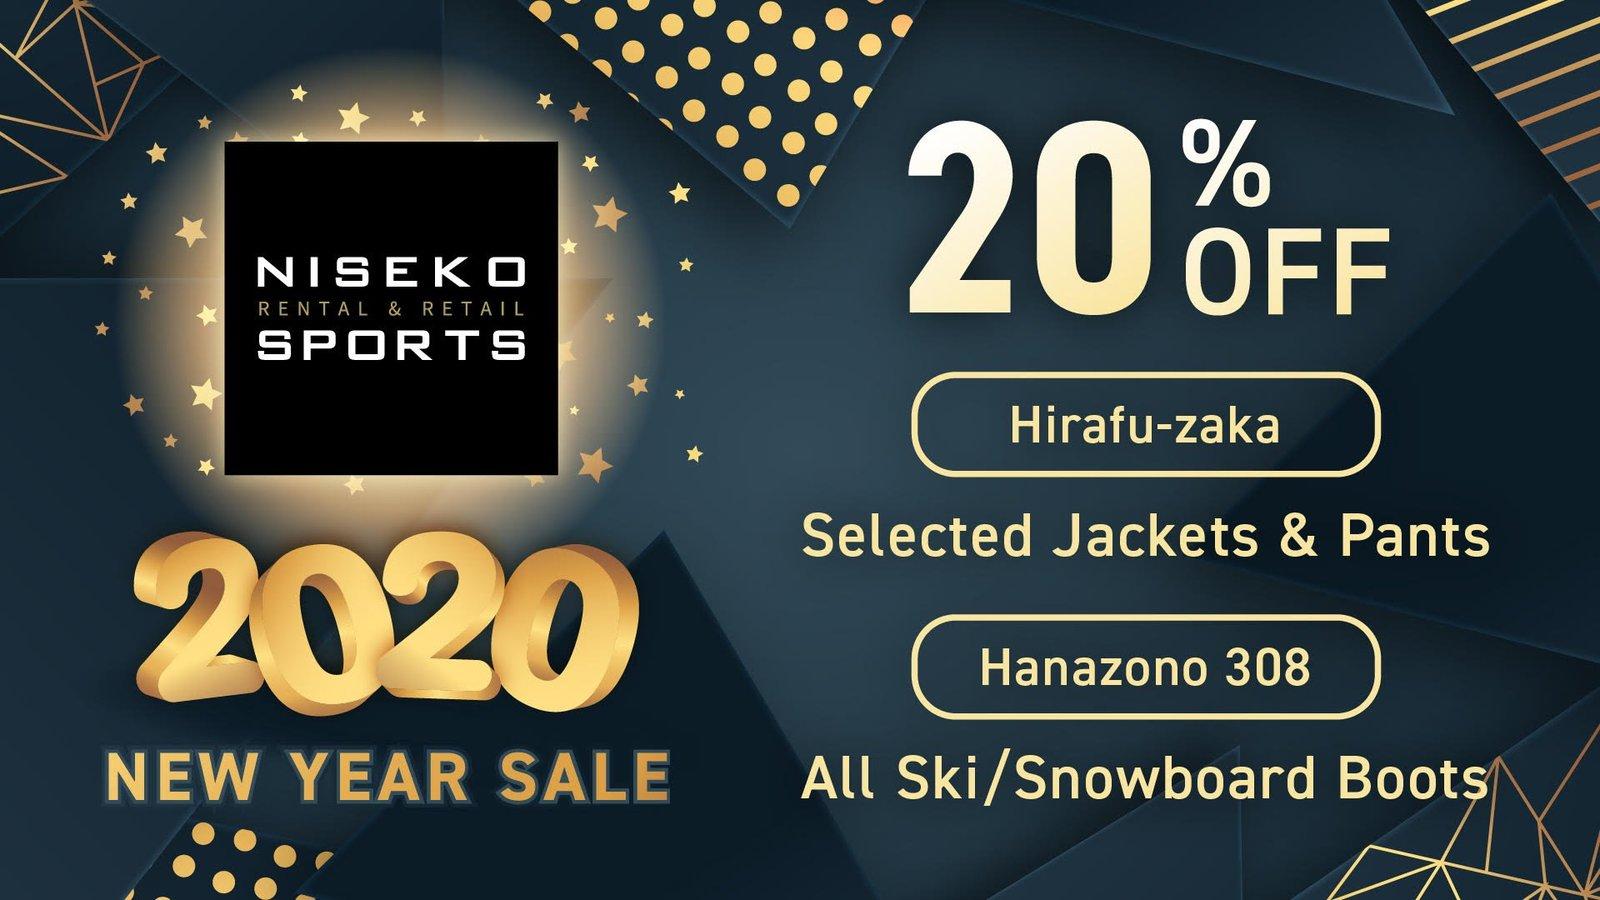 Niseko Sports New Year Sale